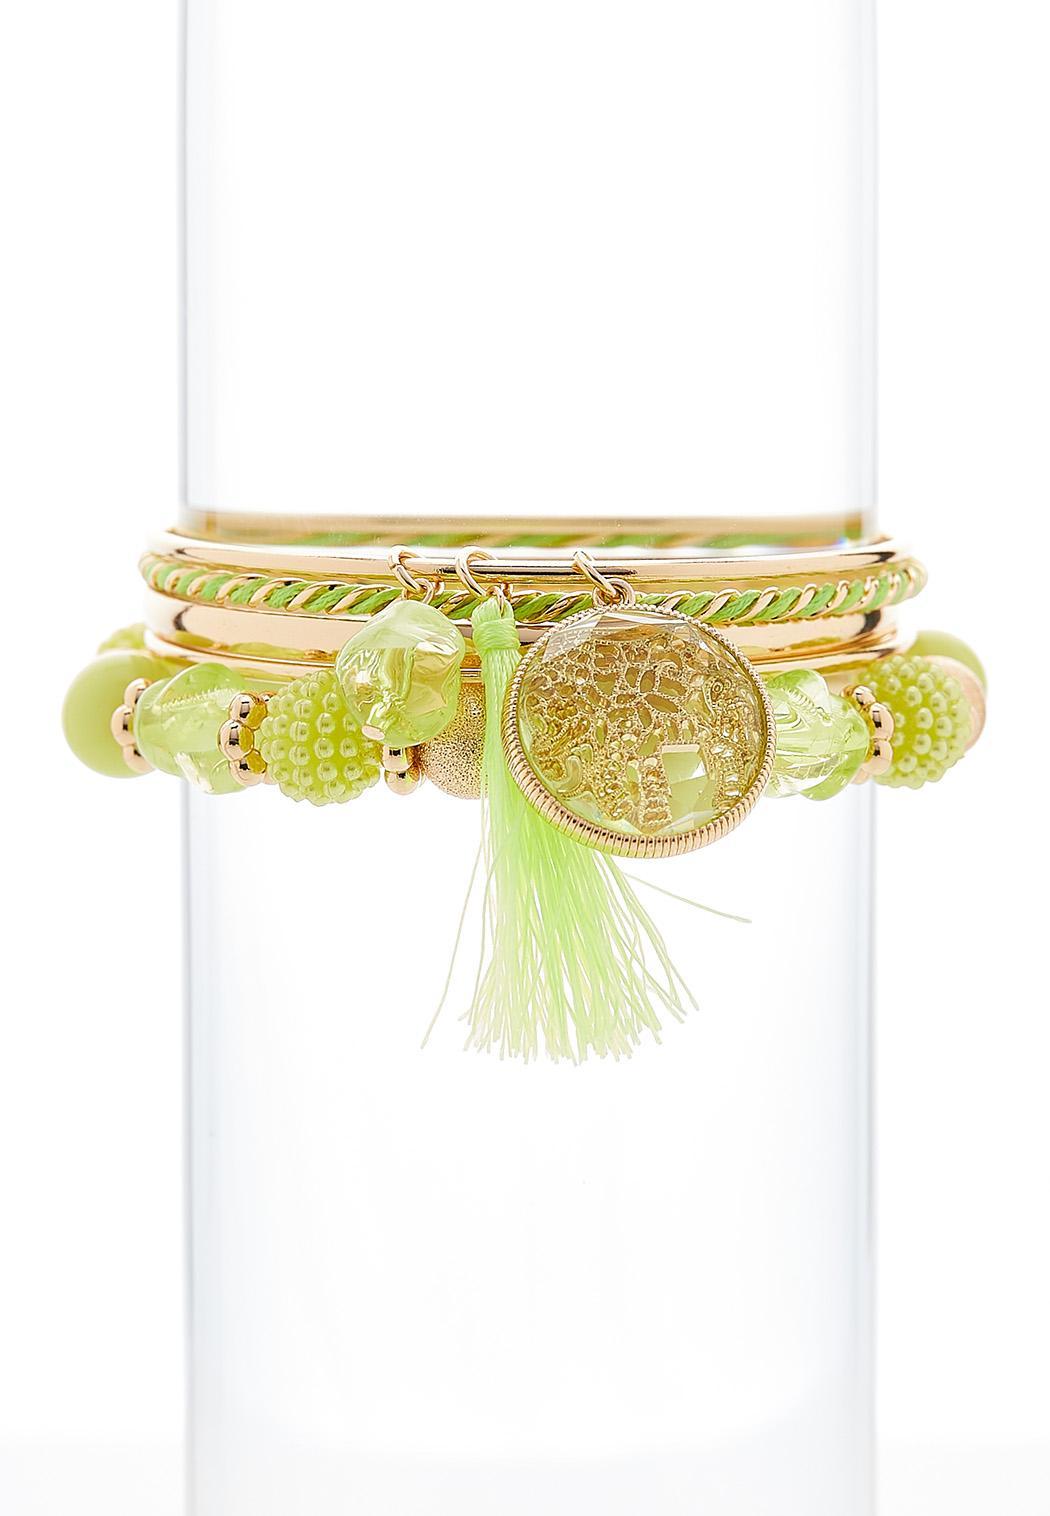 5 Piece Tasseled Bracelet Set